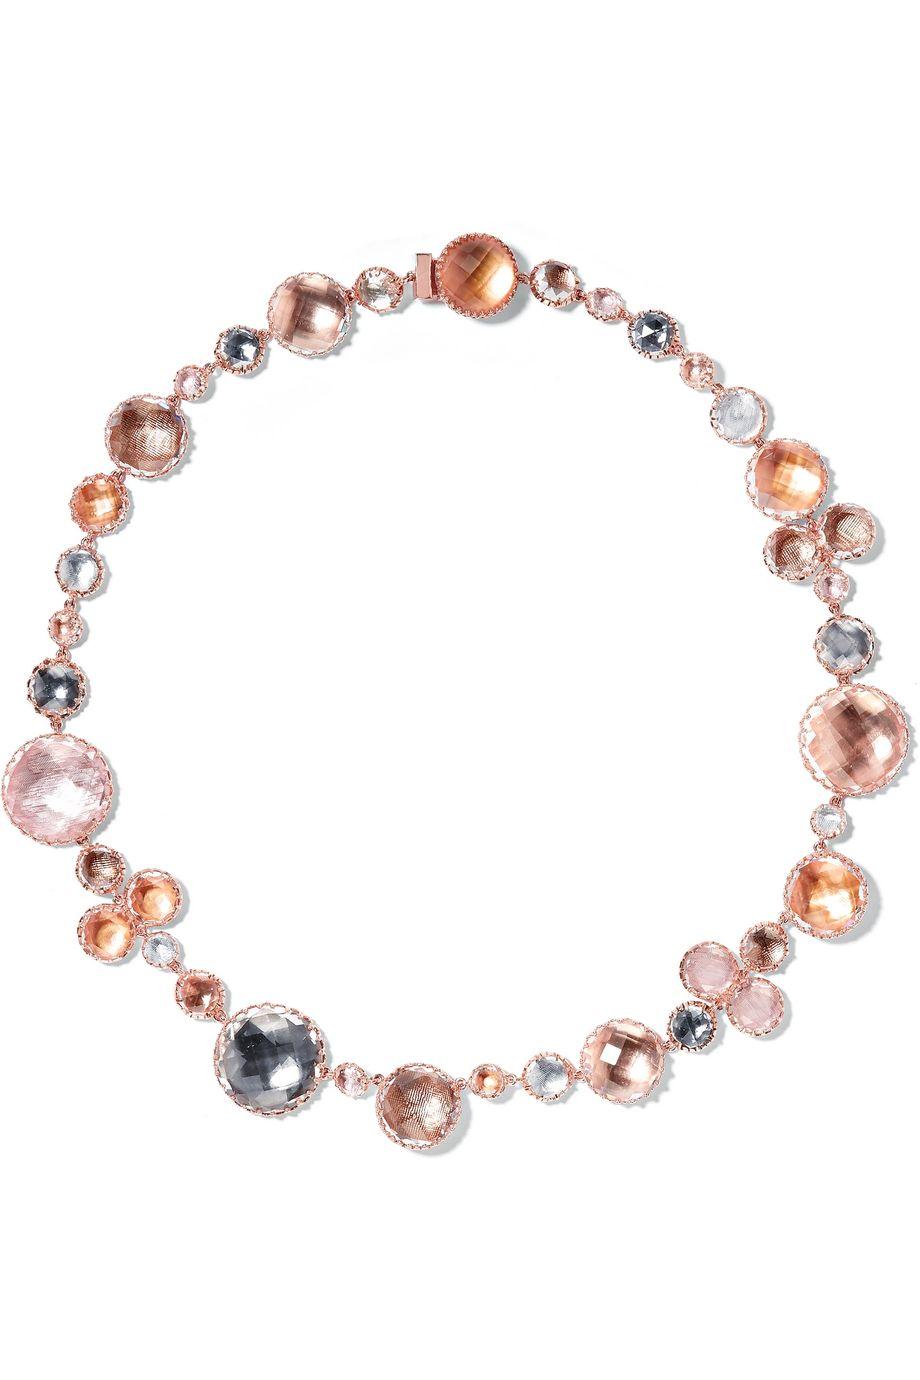 Larkspur & Hawk Sadie Rivière 14-karat rose gold-dipped quartz necklace